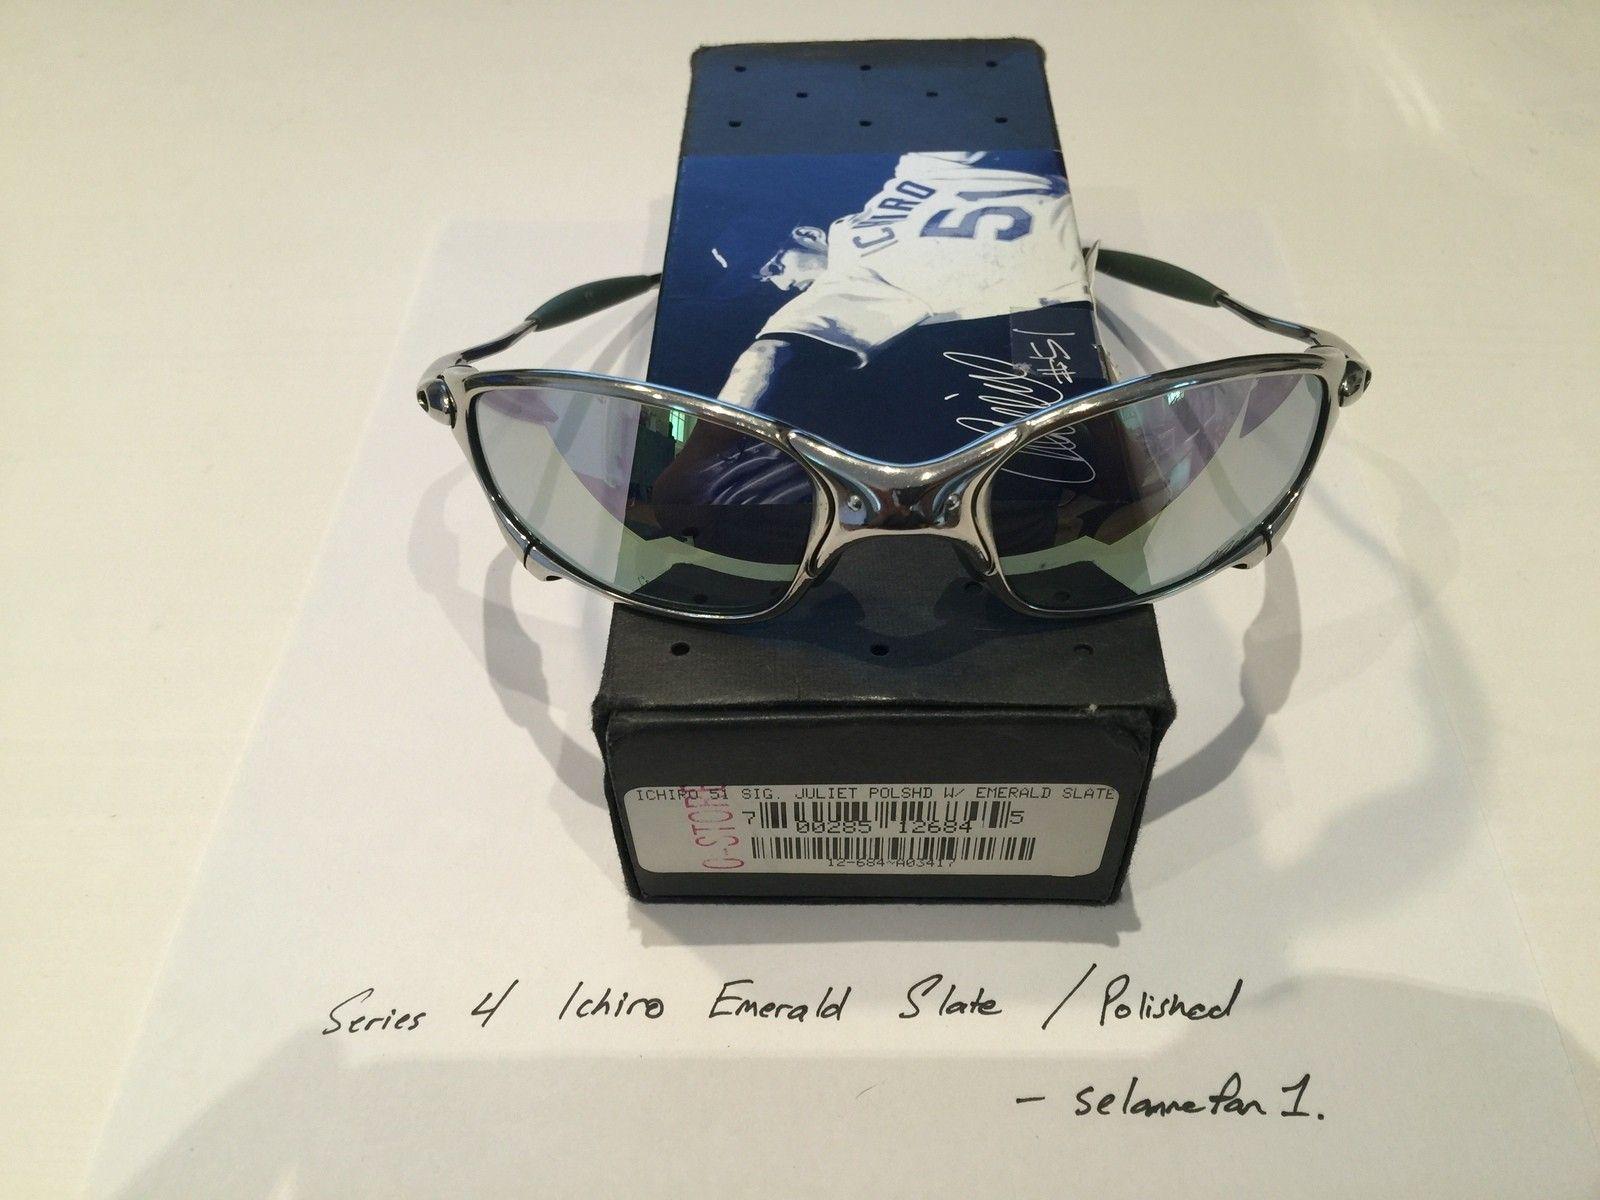 Ichiro Emerald Slate / Polished Frame Juliets (with box) - IMG_3812.JPG